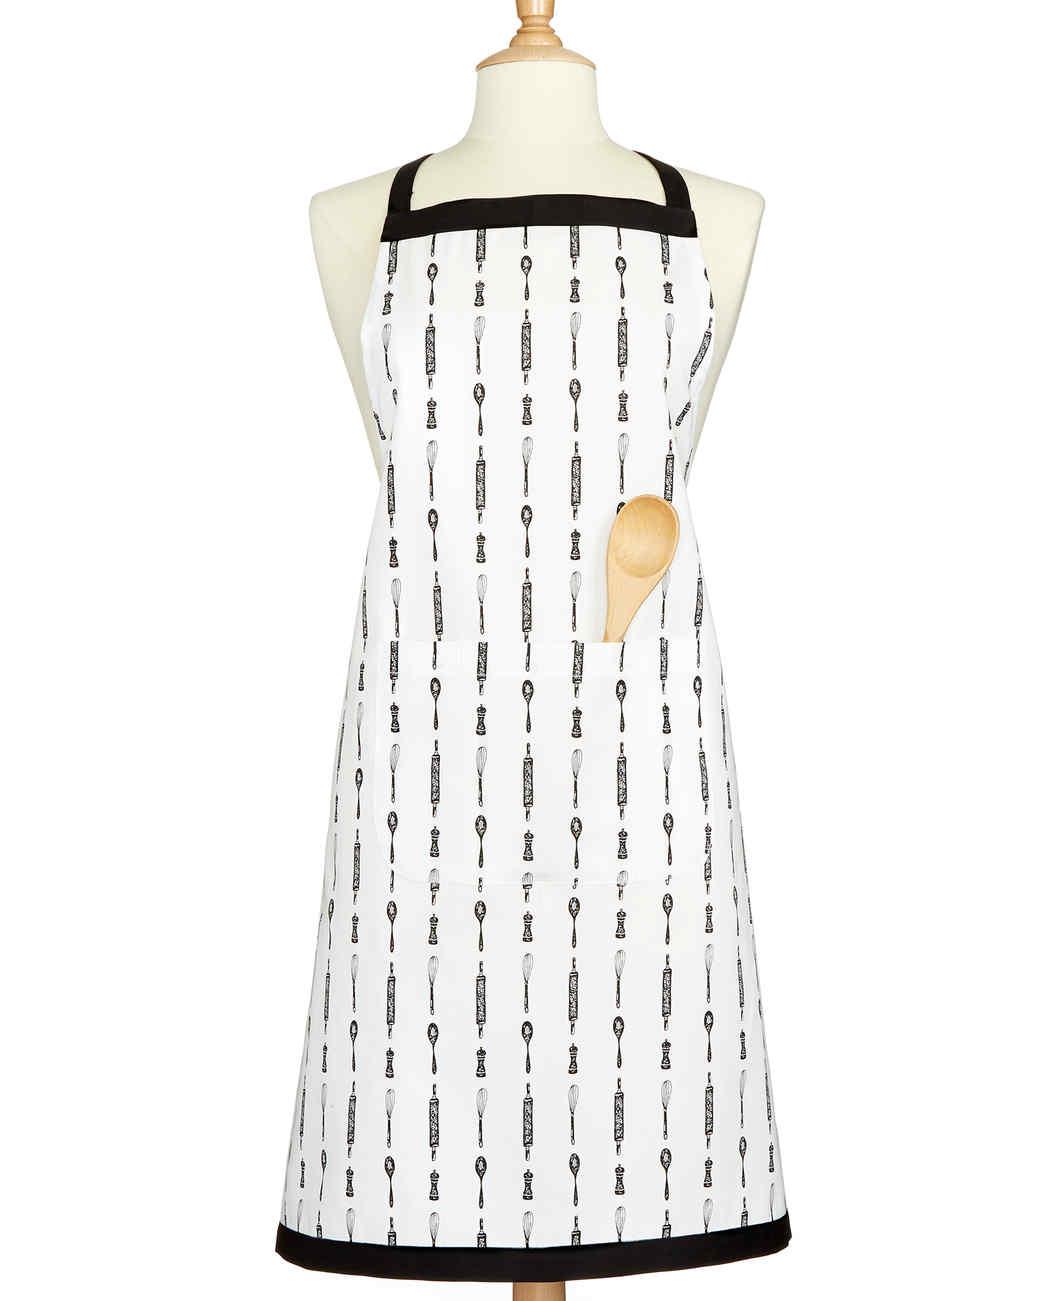 White apron macy's - White Apron Macy's 8